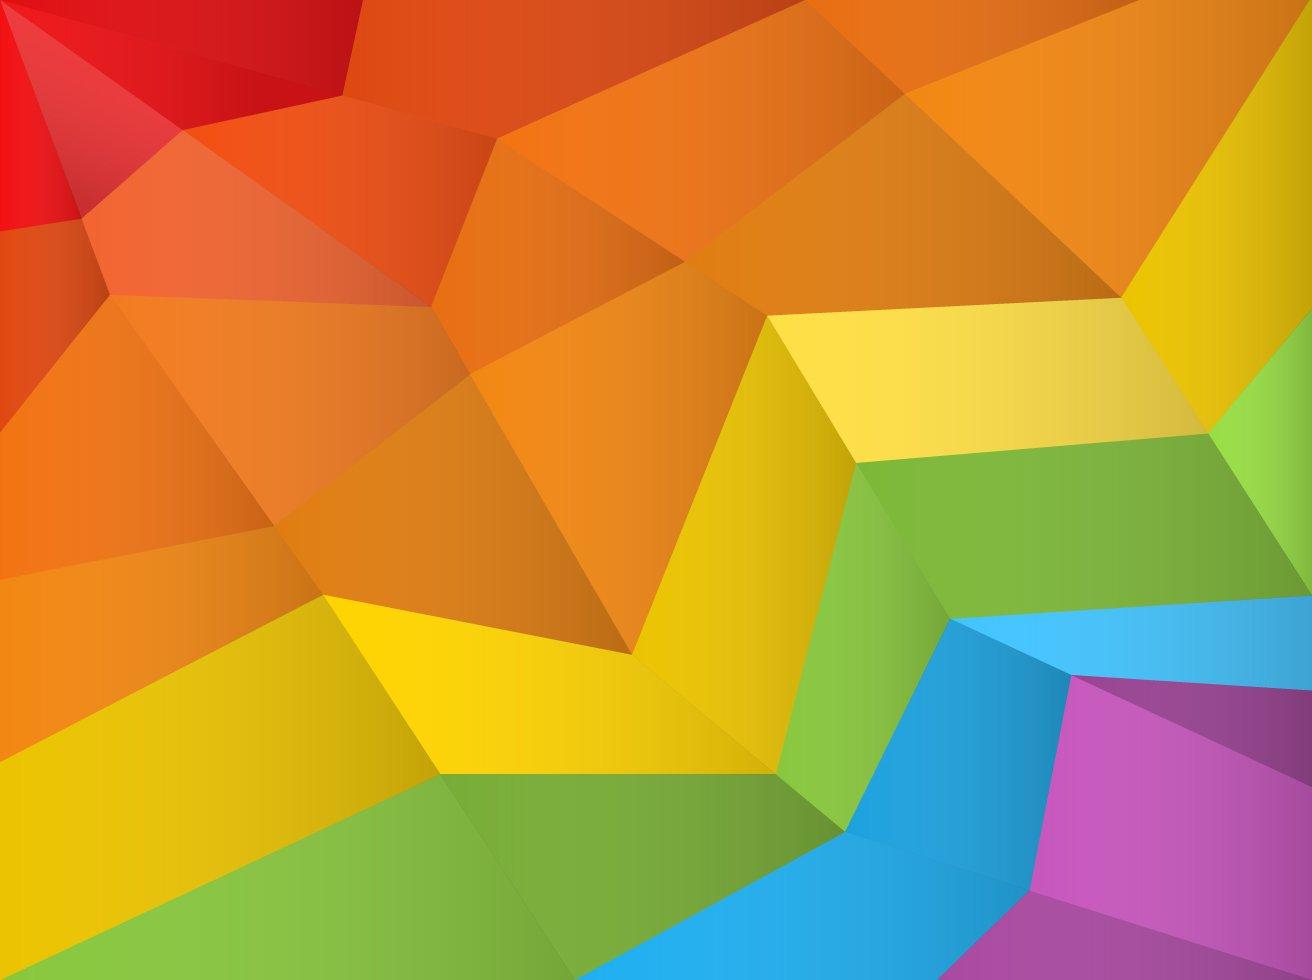 1312x980 Free Polygonal Rainbow Background Vector Vector Art Amp Graphics